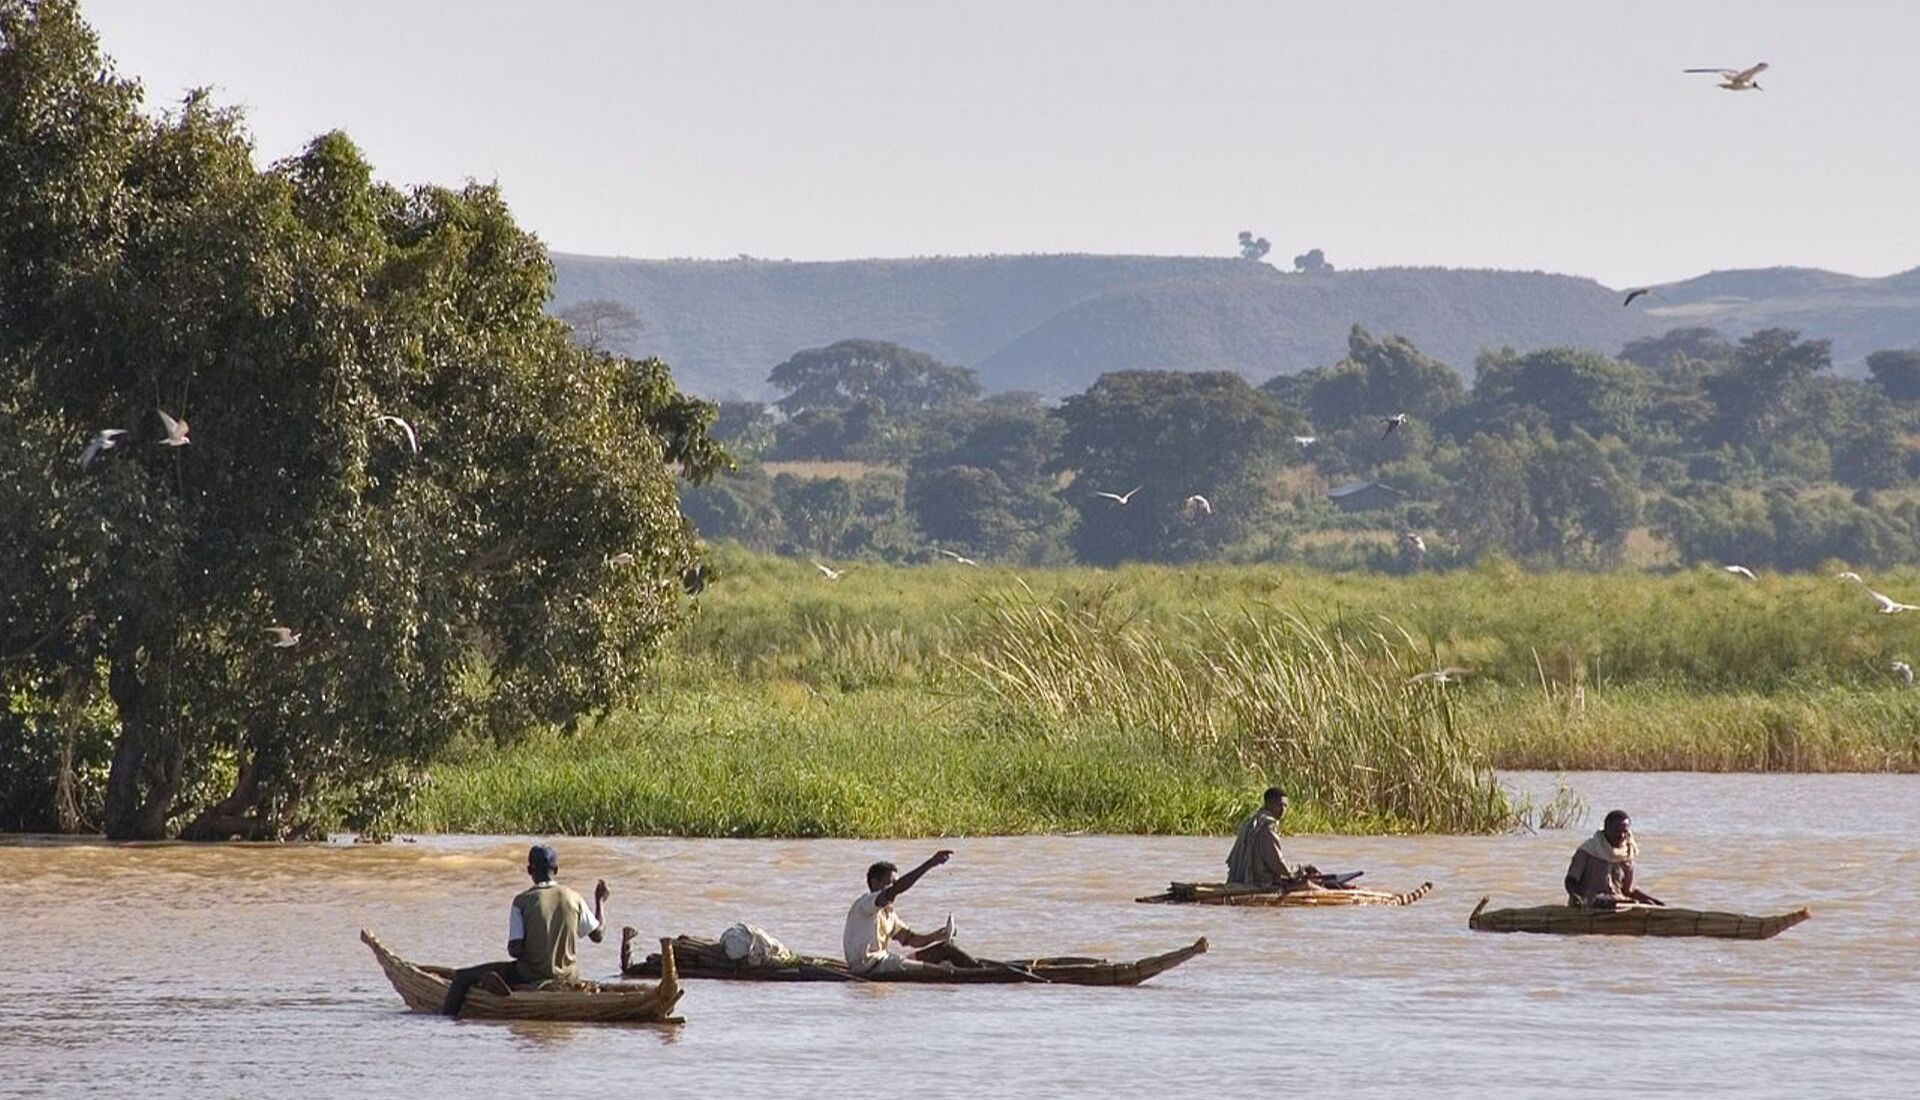 Fishermen on Lake Tanna